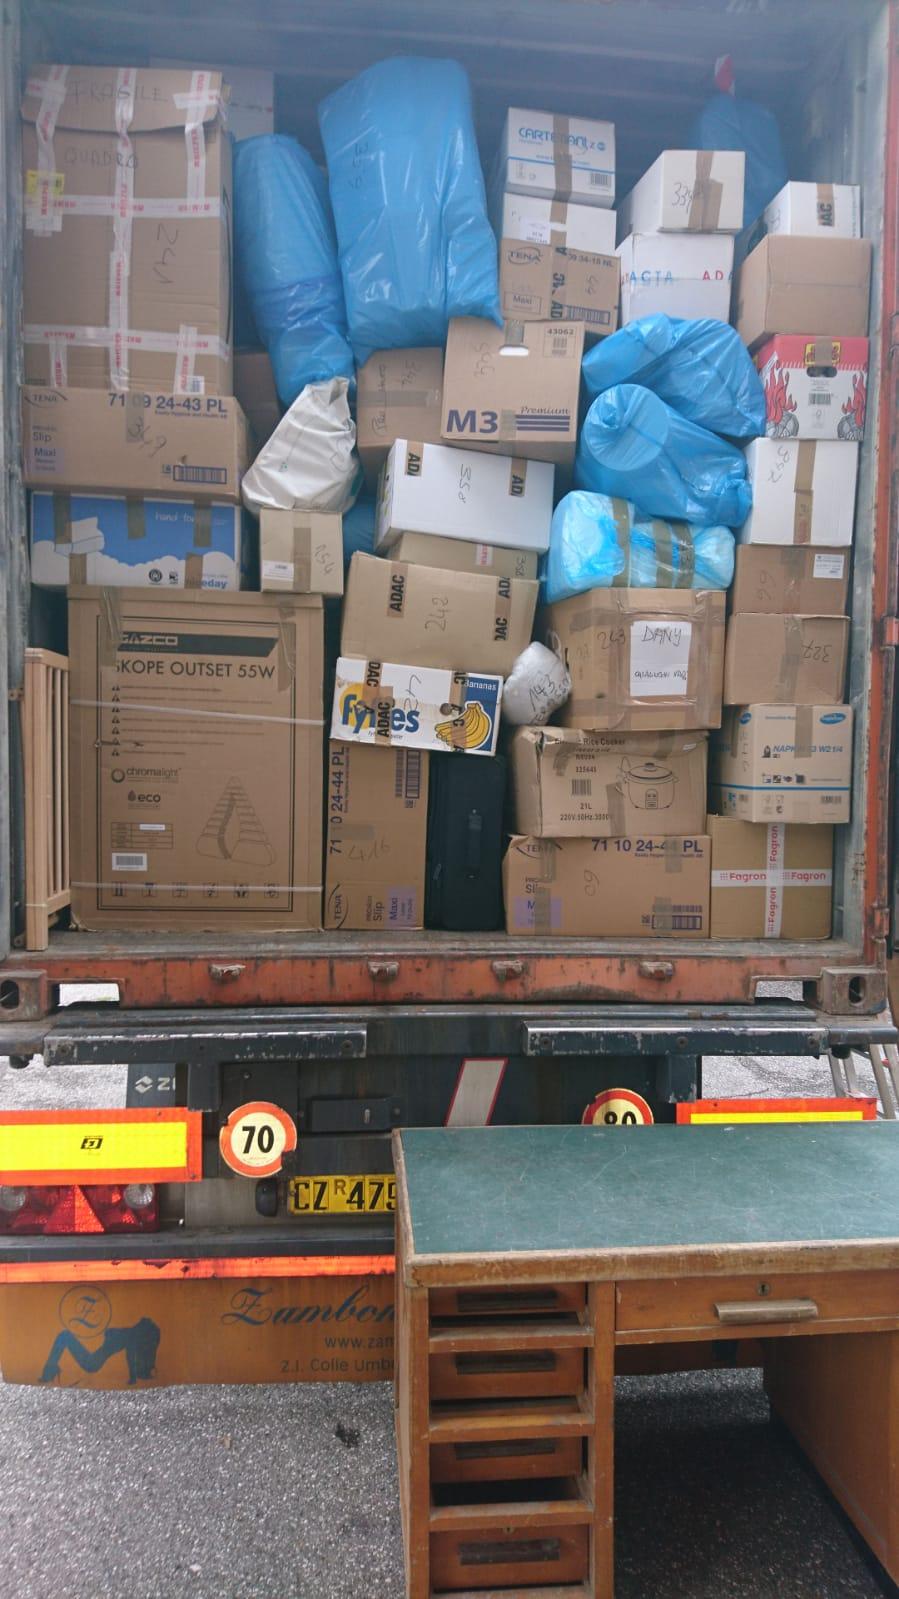 container-22-9-2020-IMG-20200922-WA0002